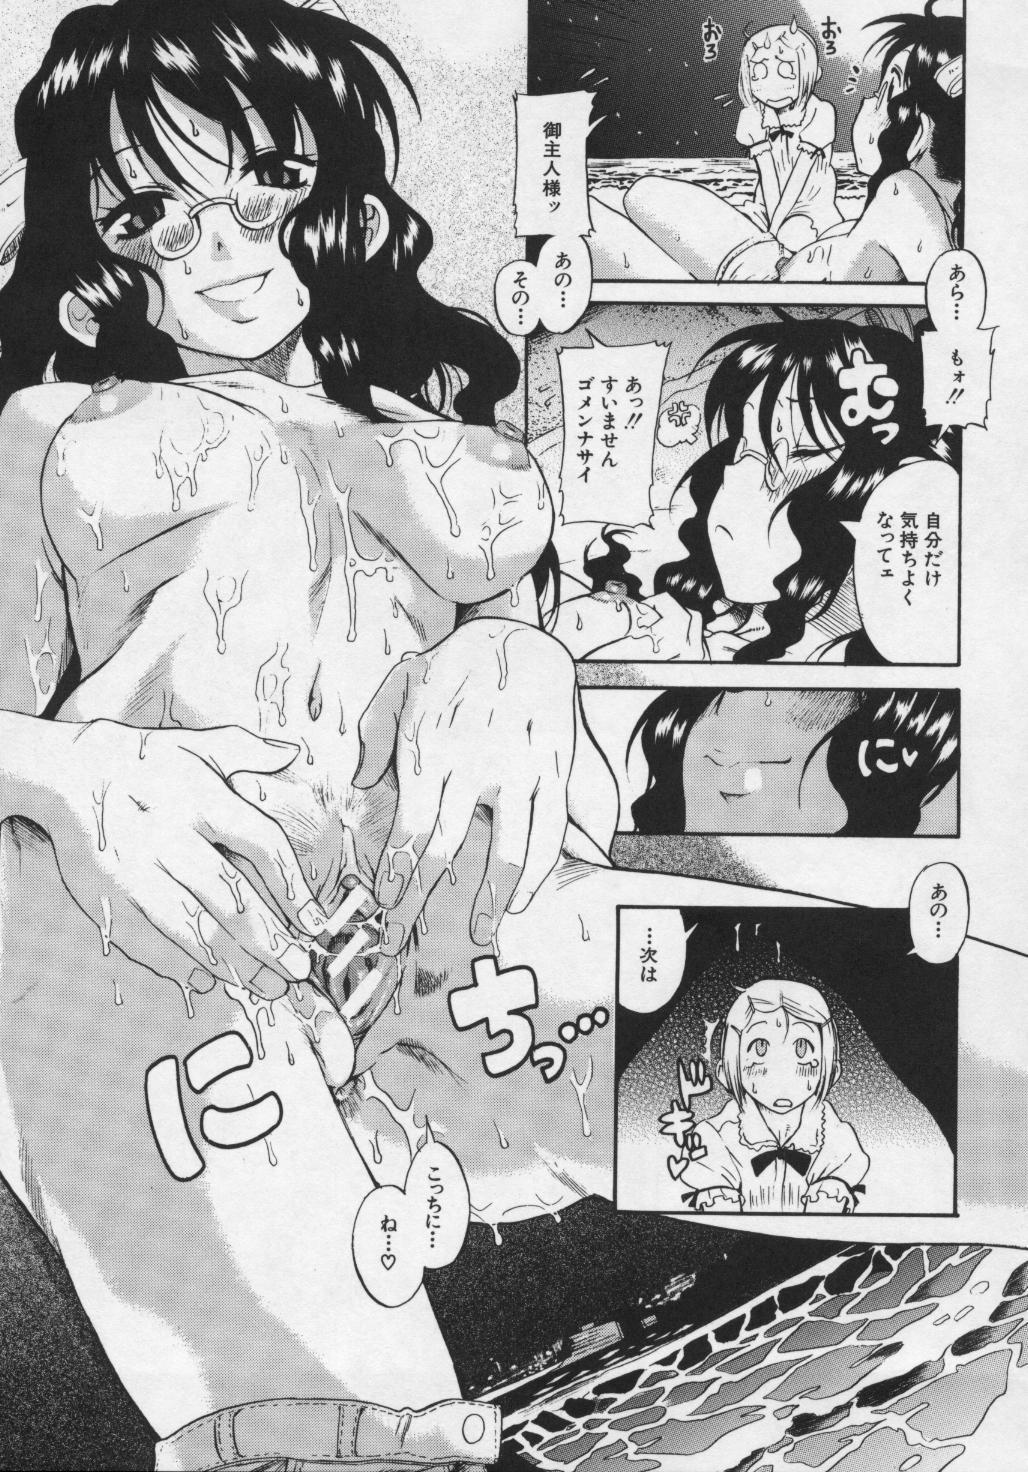 Kimi no Na o Yobeba - If I call your name. 137